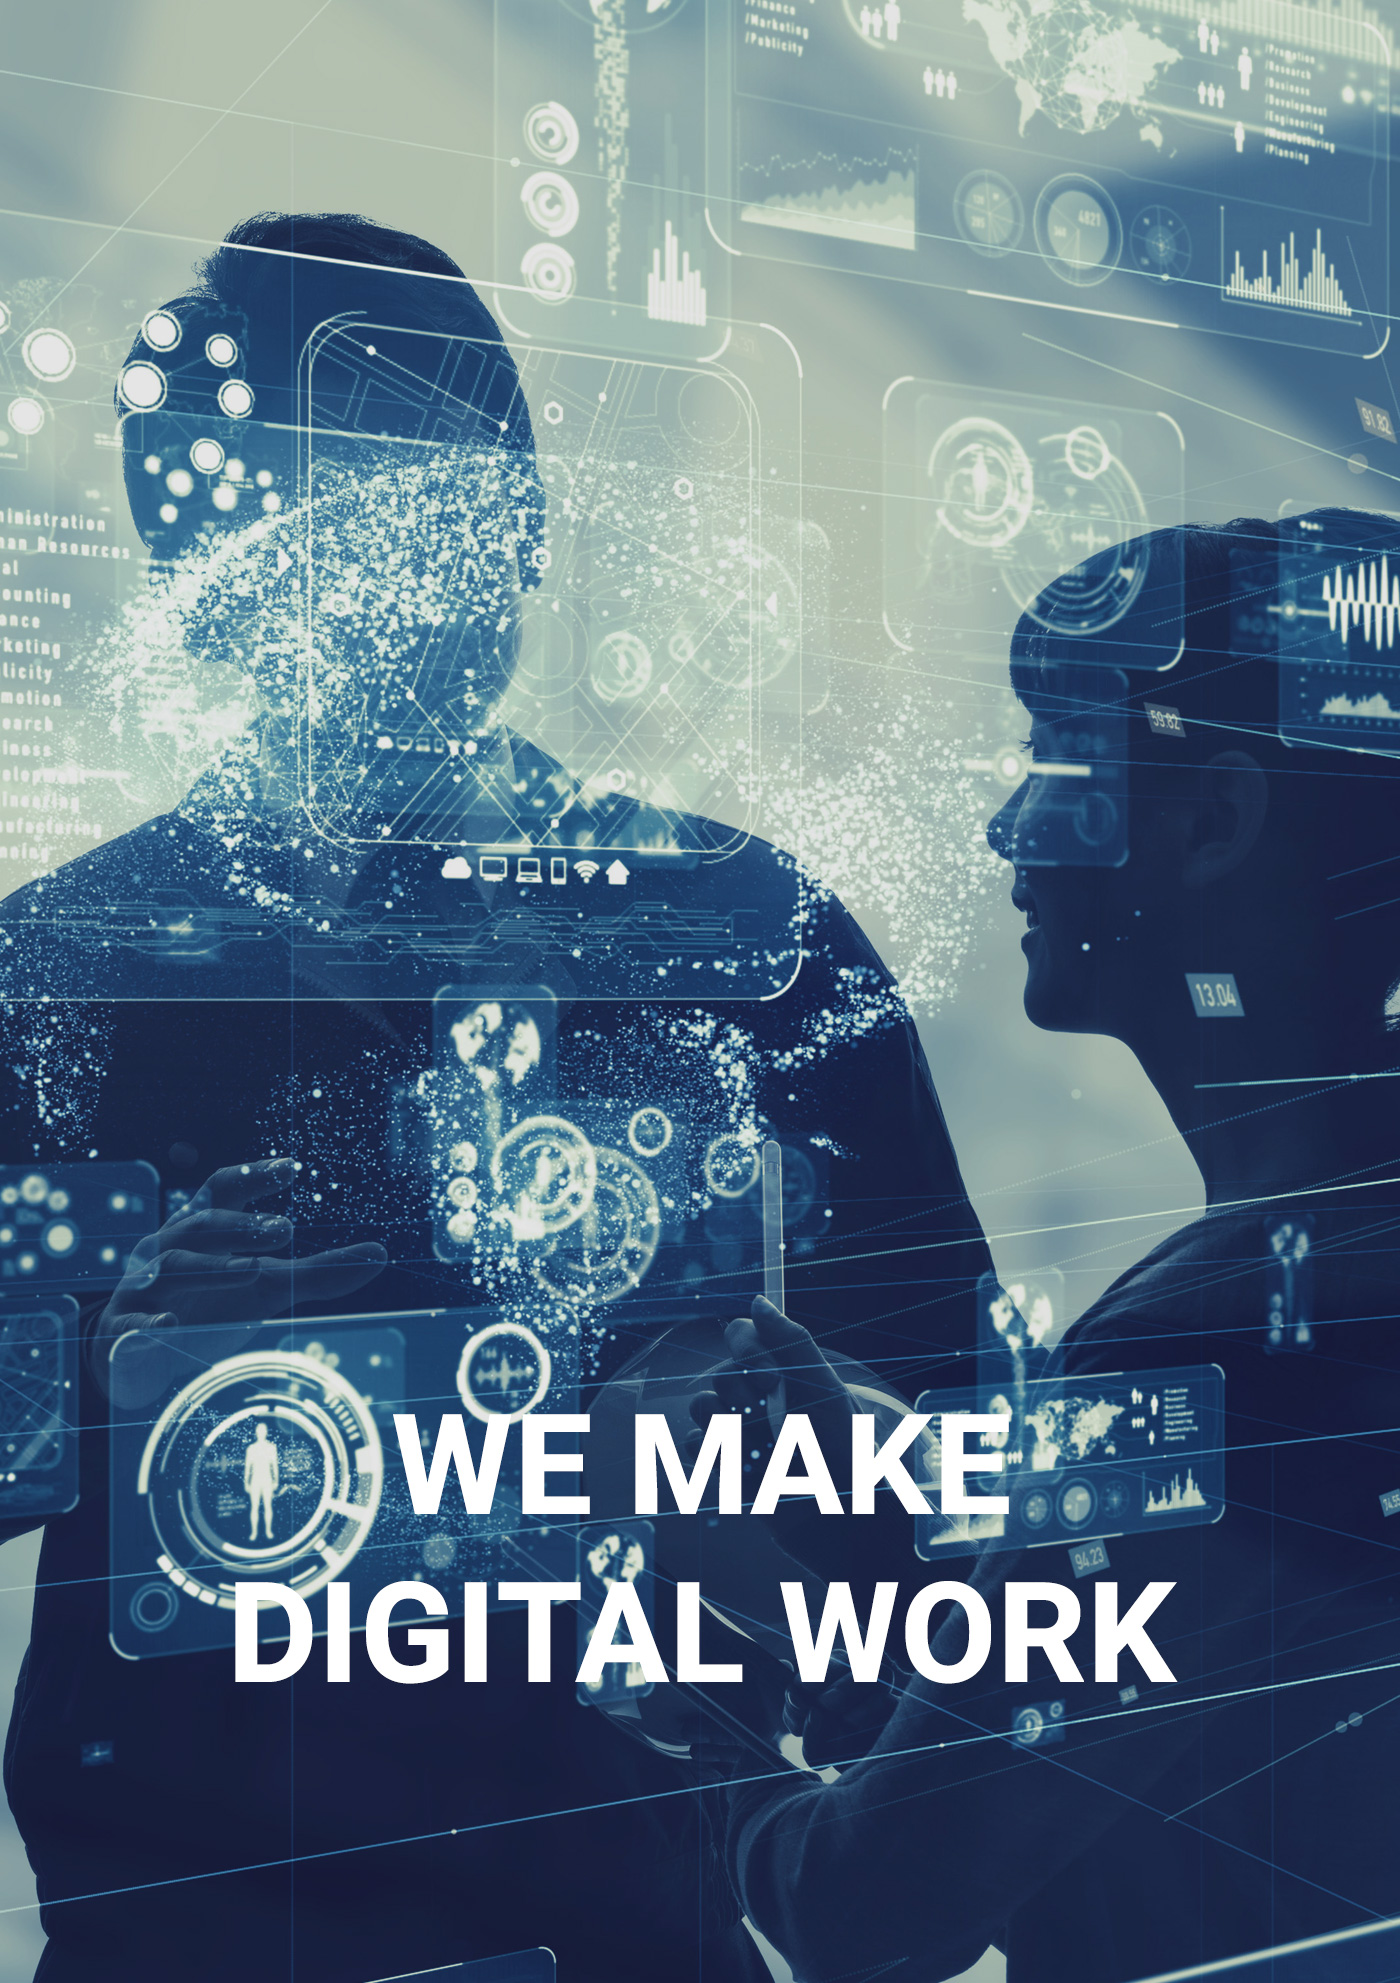 workz-seminarier-framtidens-digitalisering-icit